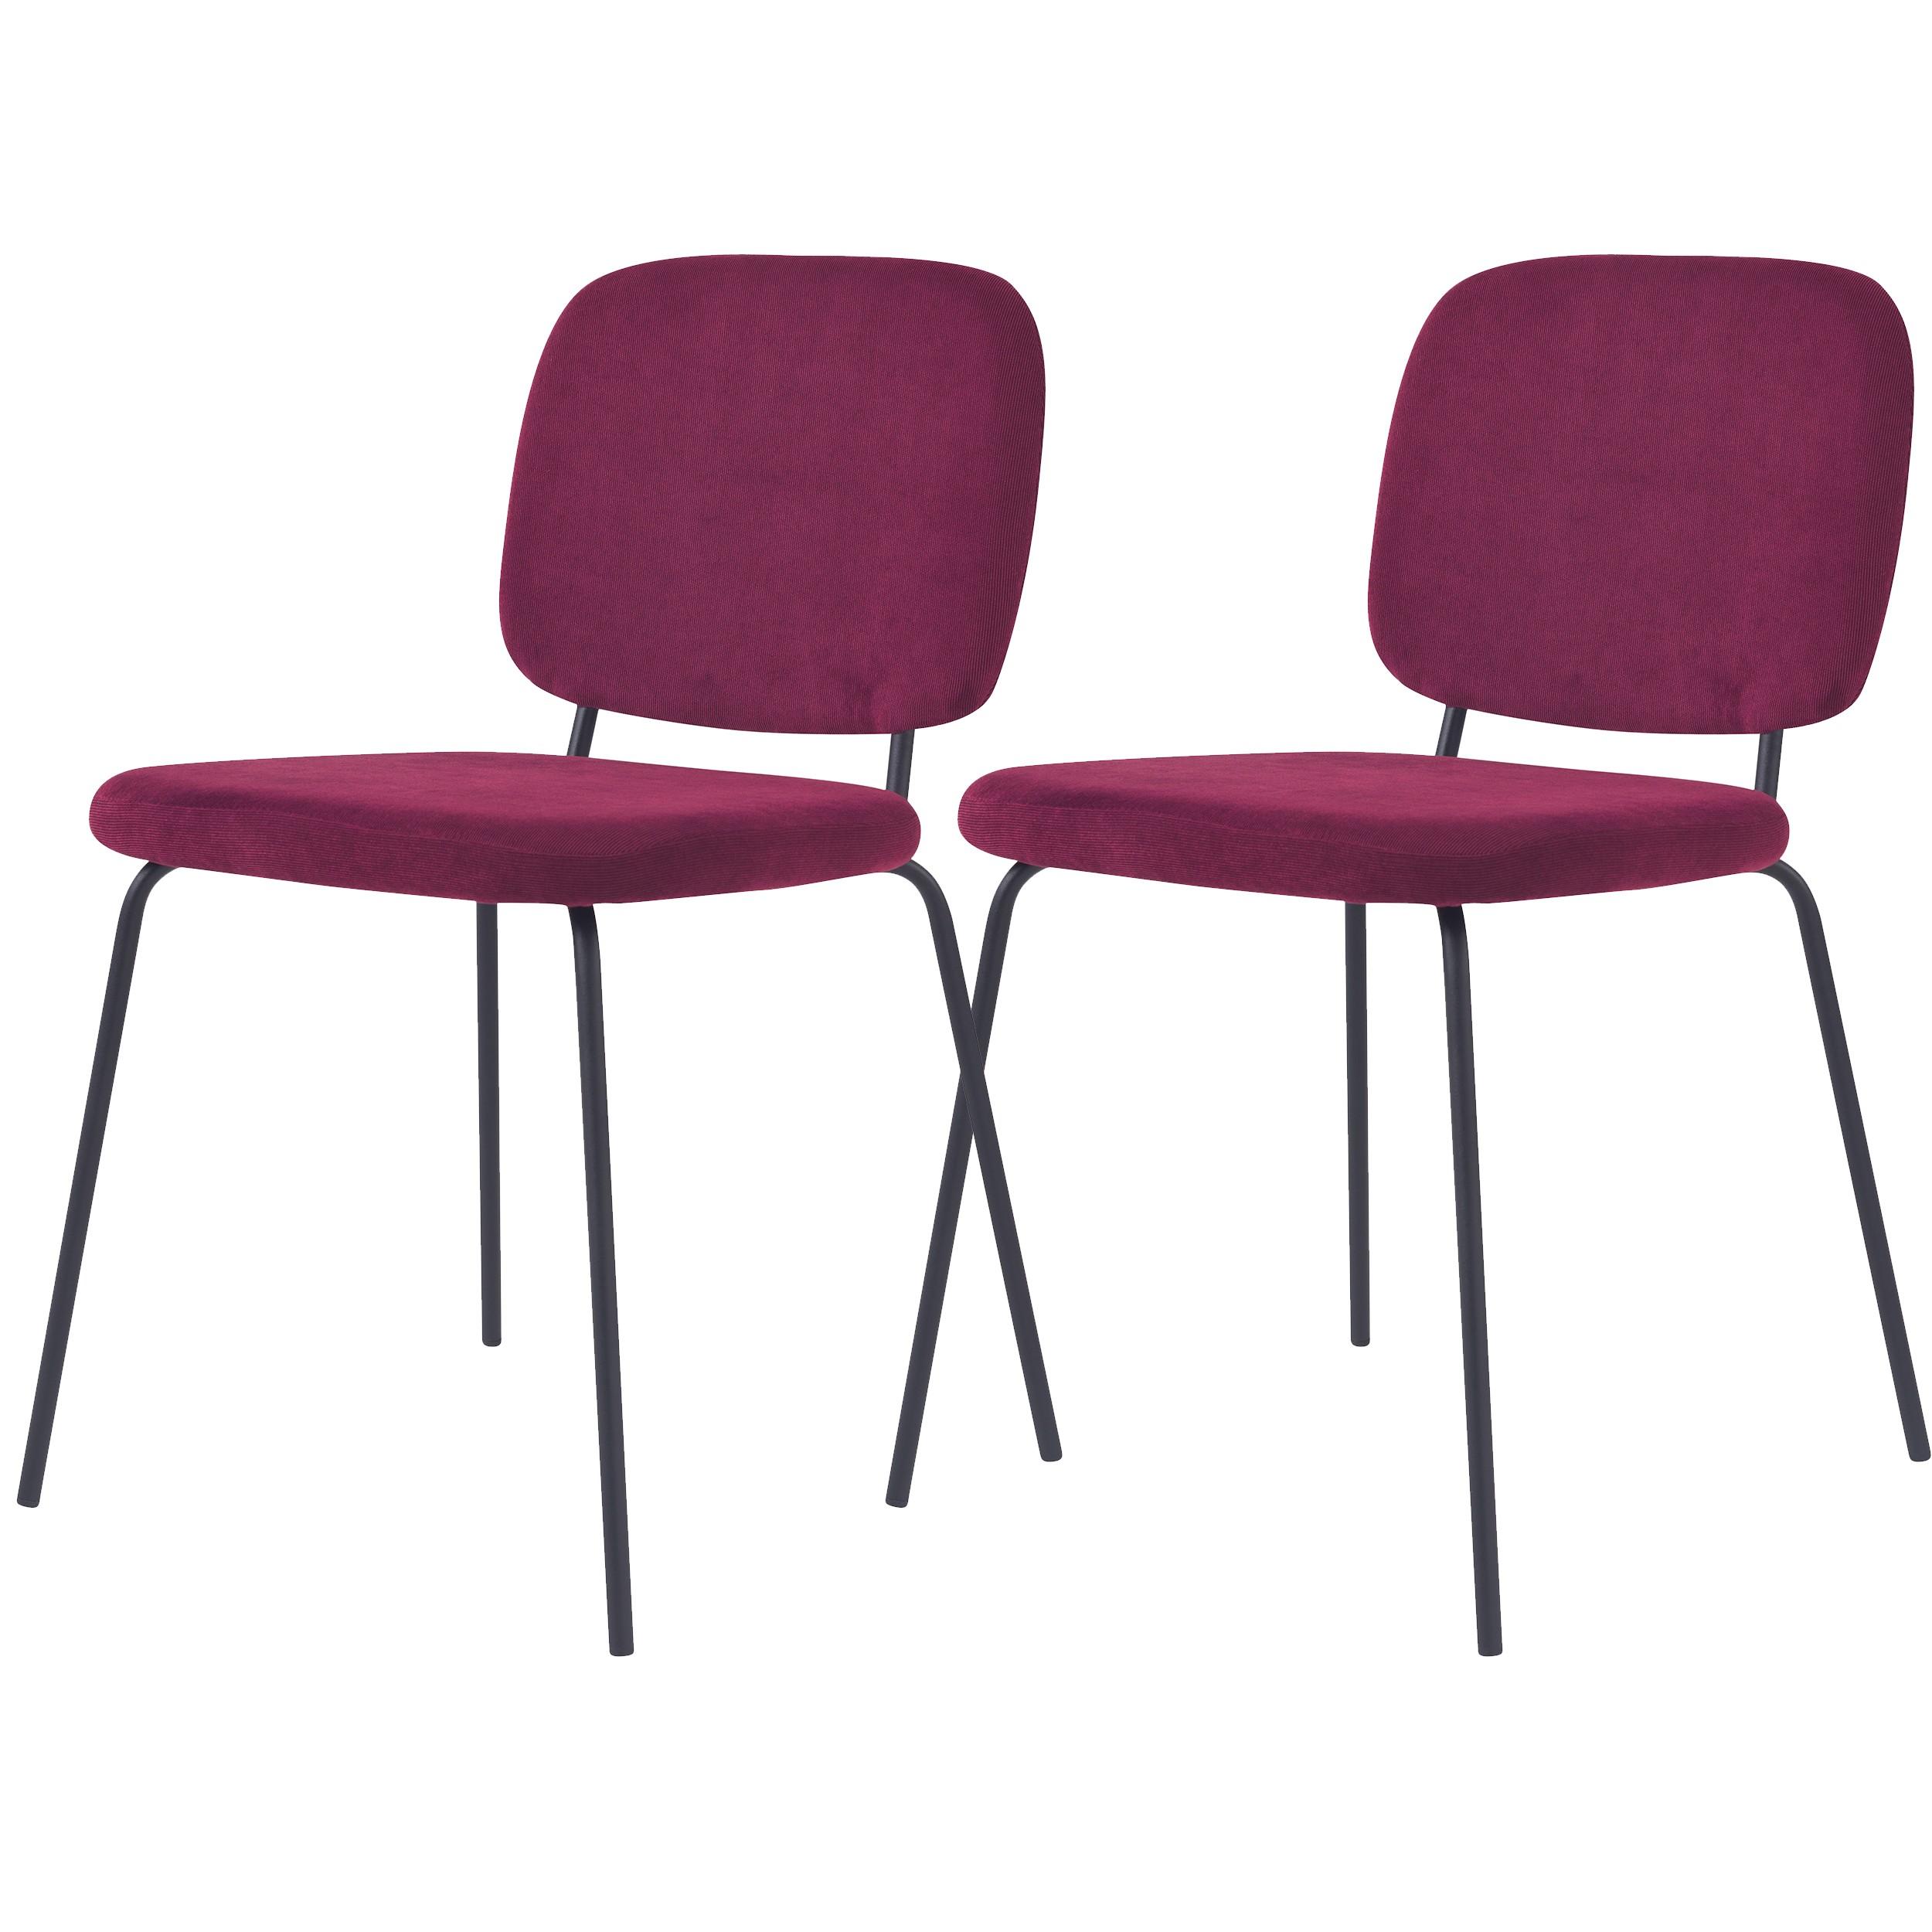 acheter chaise prune velours cotele